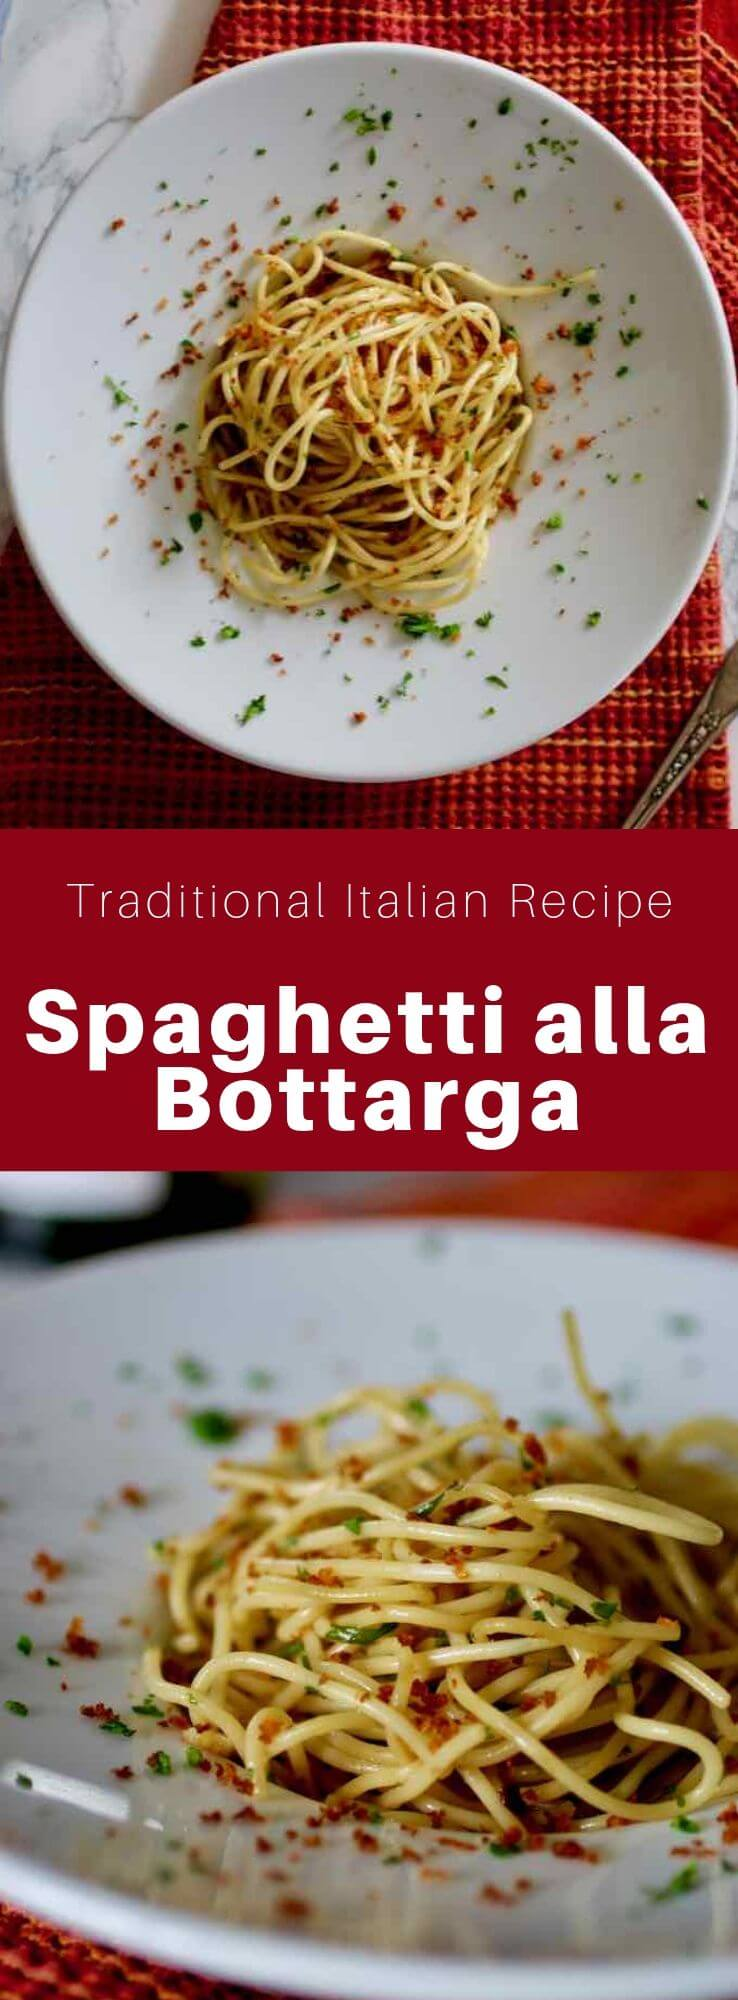 Spaghetti alla bottarga is a delicious traditional Italian pasta dish served with salted and cured fish eggs called bottarga. #Italy #Sardinia #ItalianFood #ItalianRecipe #ItalianCuisine #WorldCuisine #196flavors